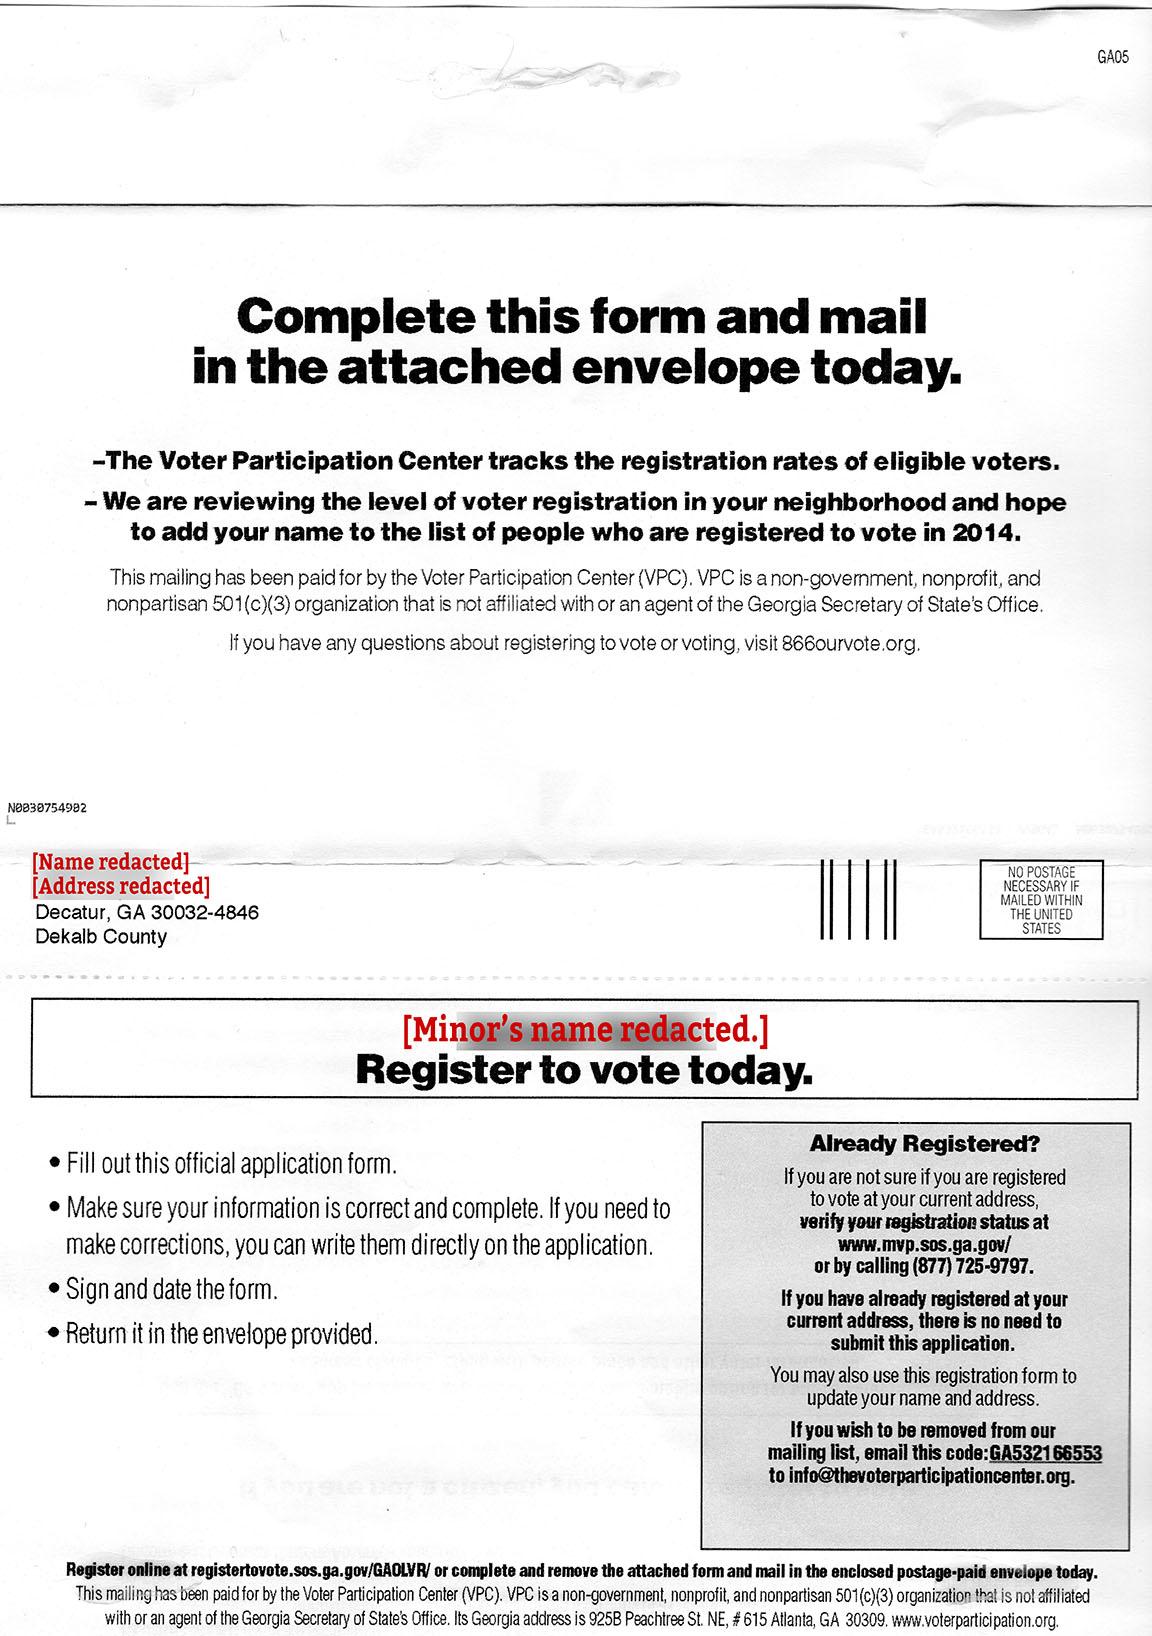 Minor Voter Registration